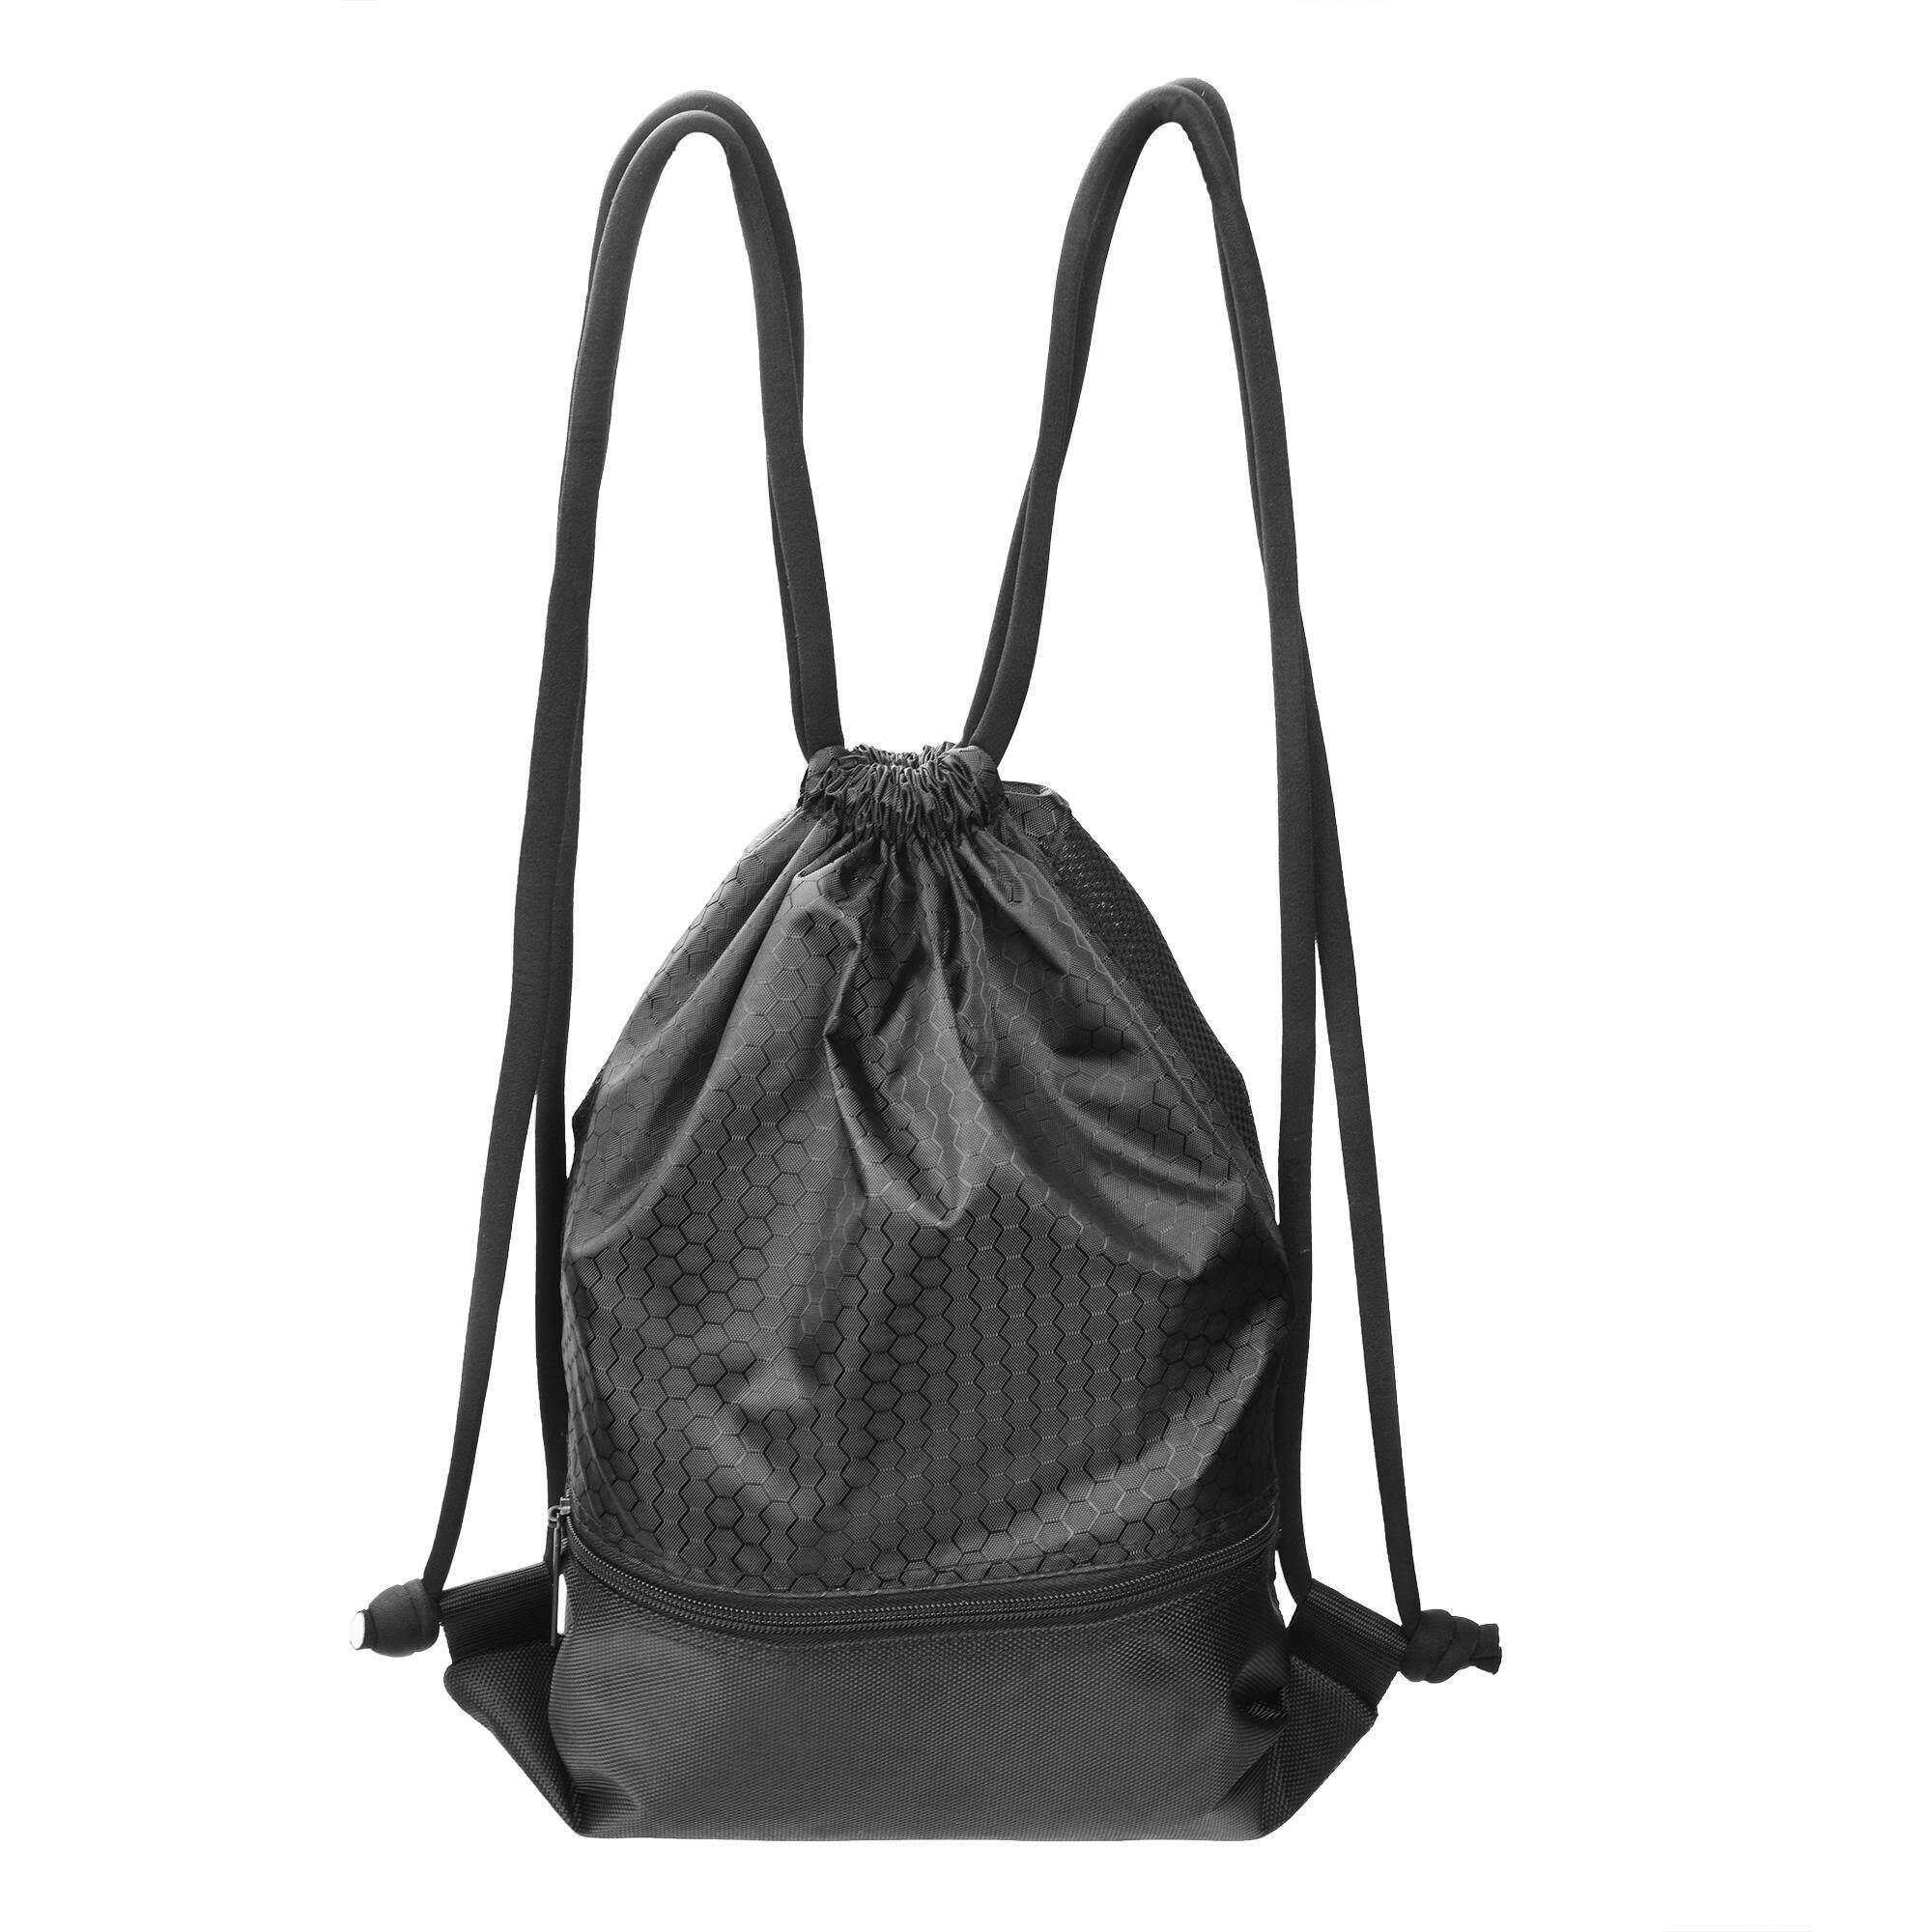 1ec0f42ba27 SDD Drawstring Storage Backpack Gym Sport Waterproof Sack pack with Pockets  for Men or Women(